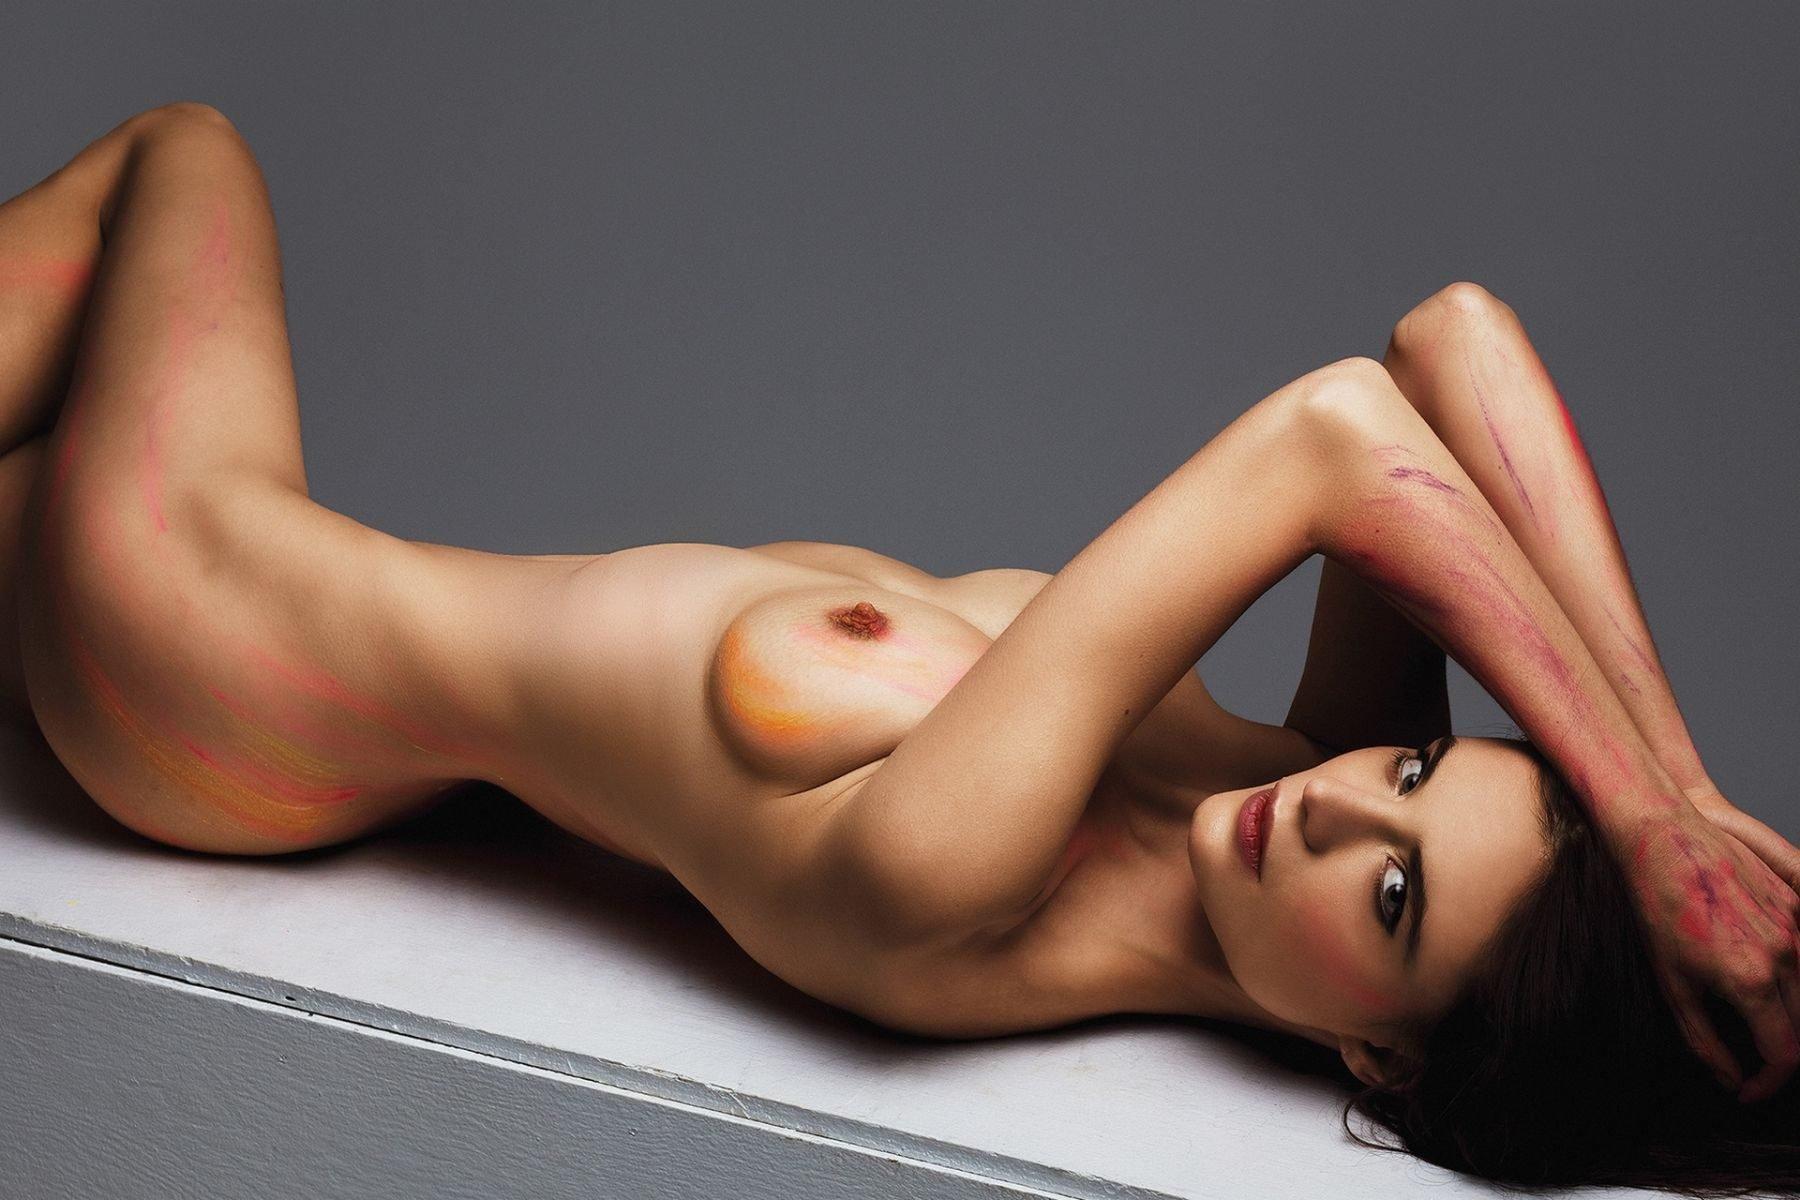 Demi rose sexy 8 nude (19 photo), Topless Celebrites photo